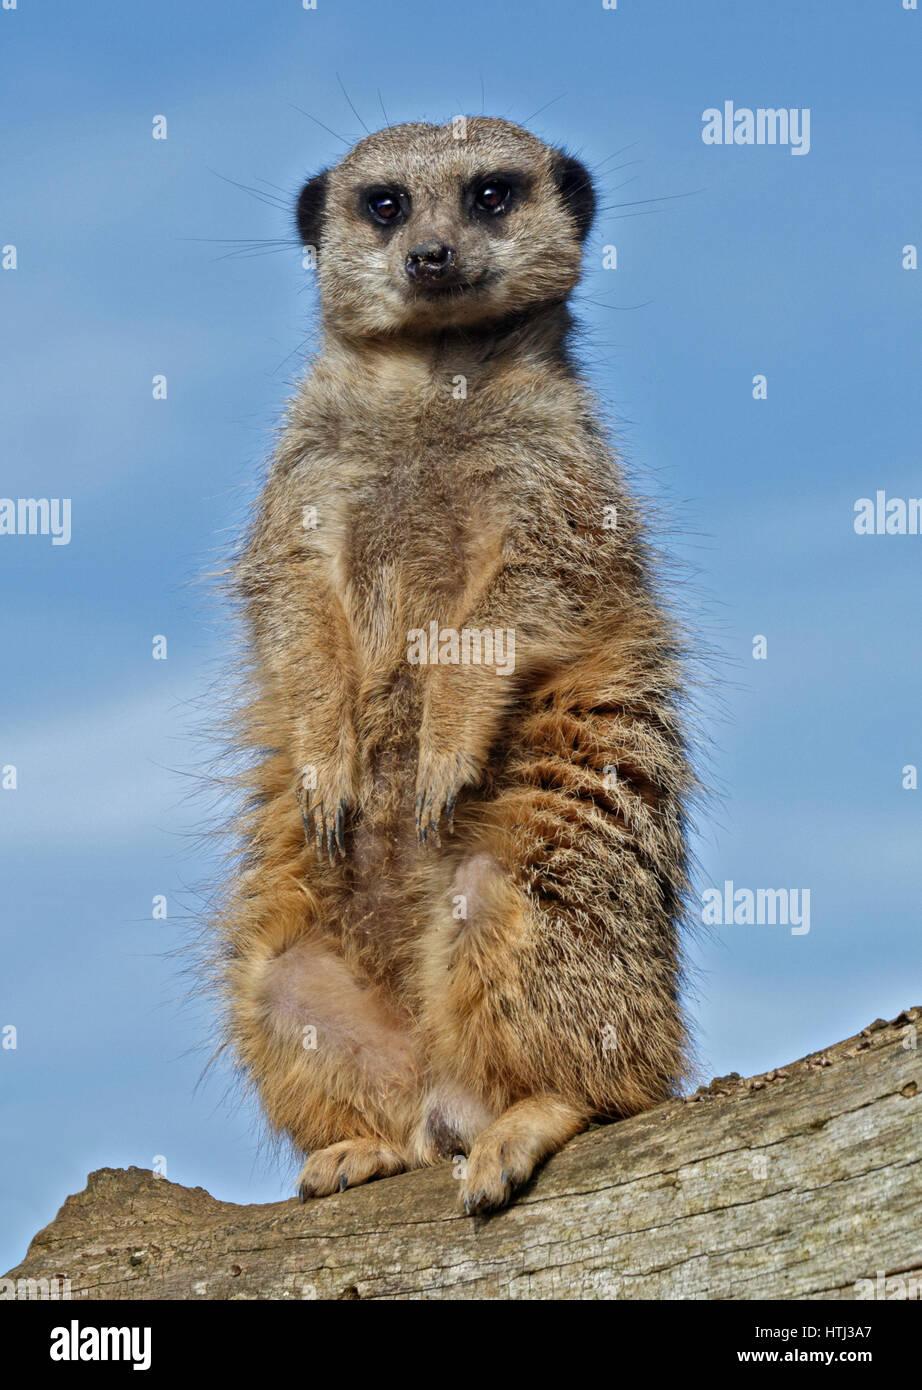 Slender-Tailed Meerkat (suricata suricatta) - Stock Image